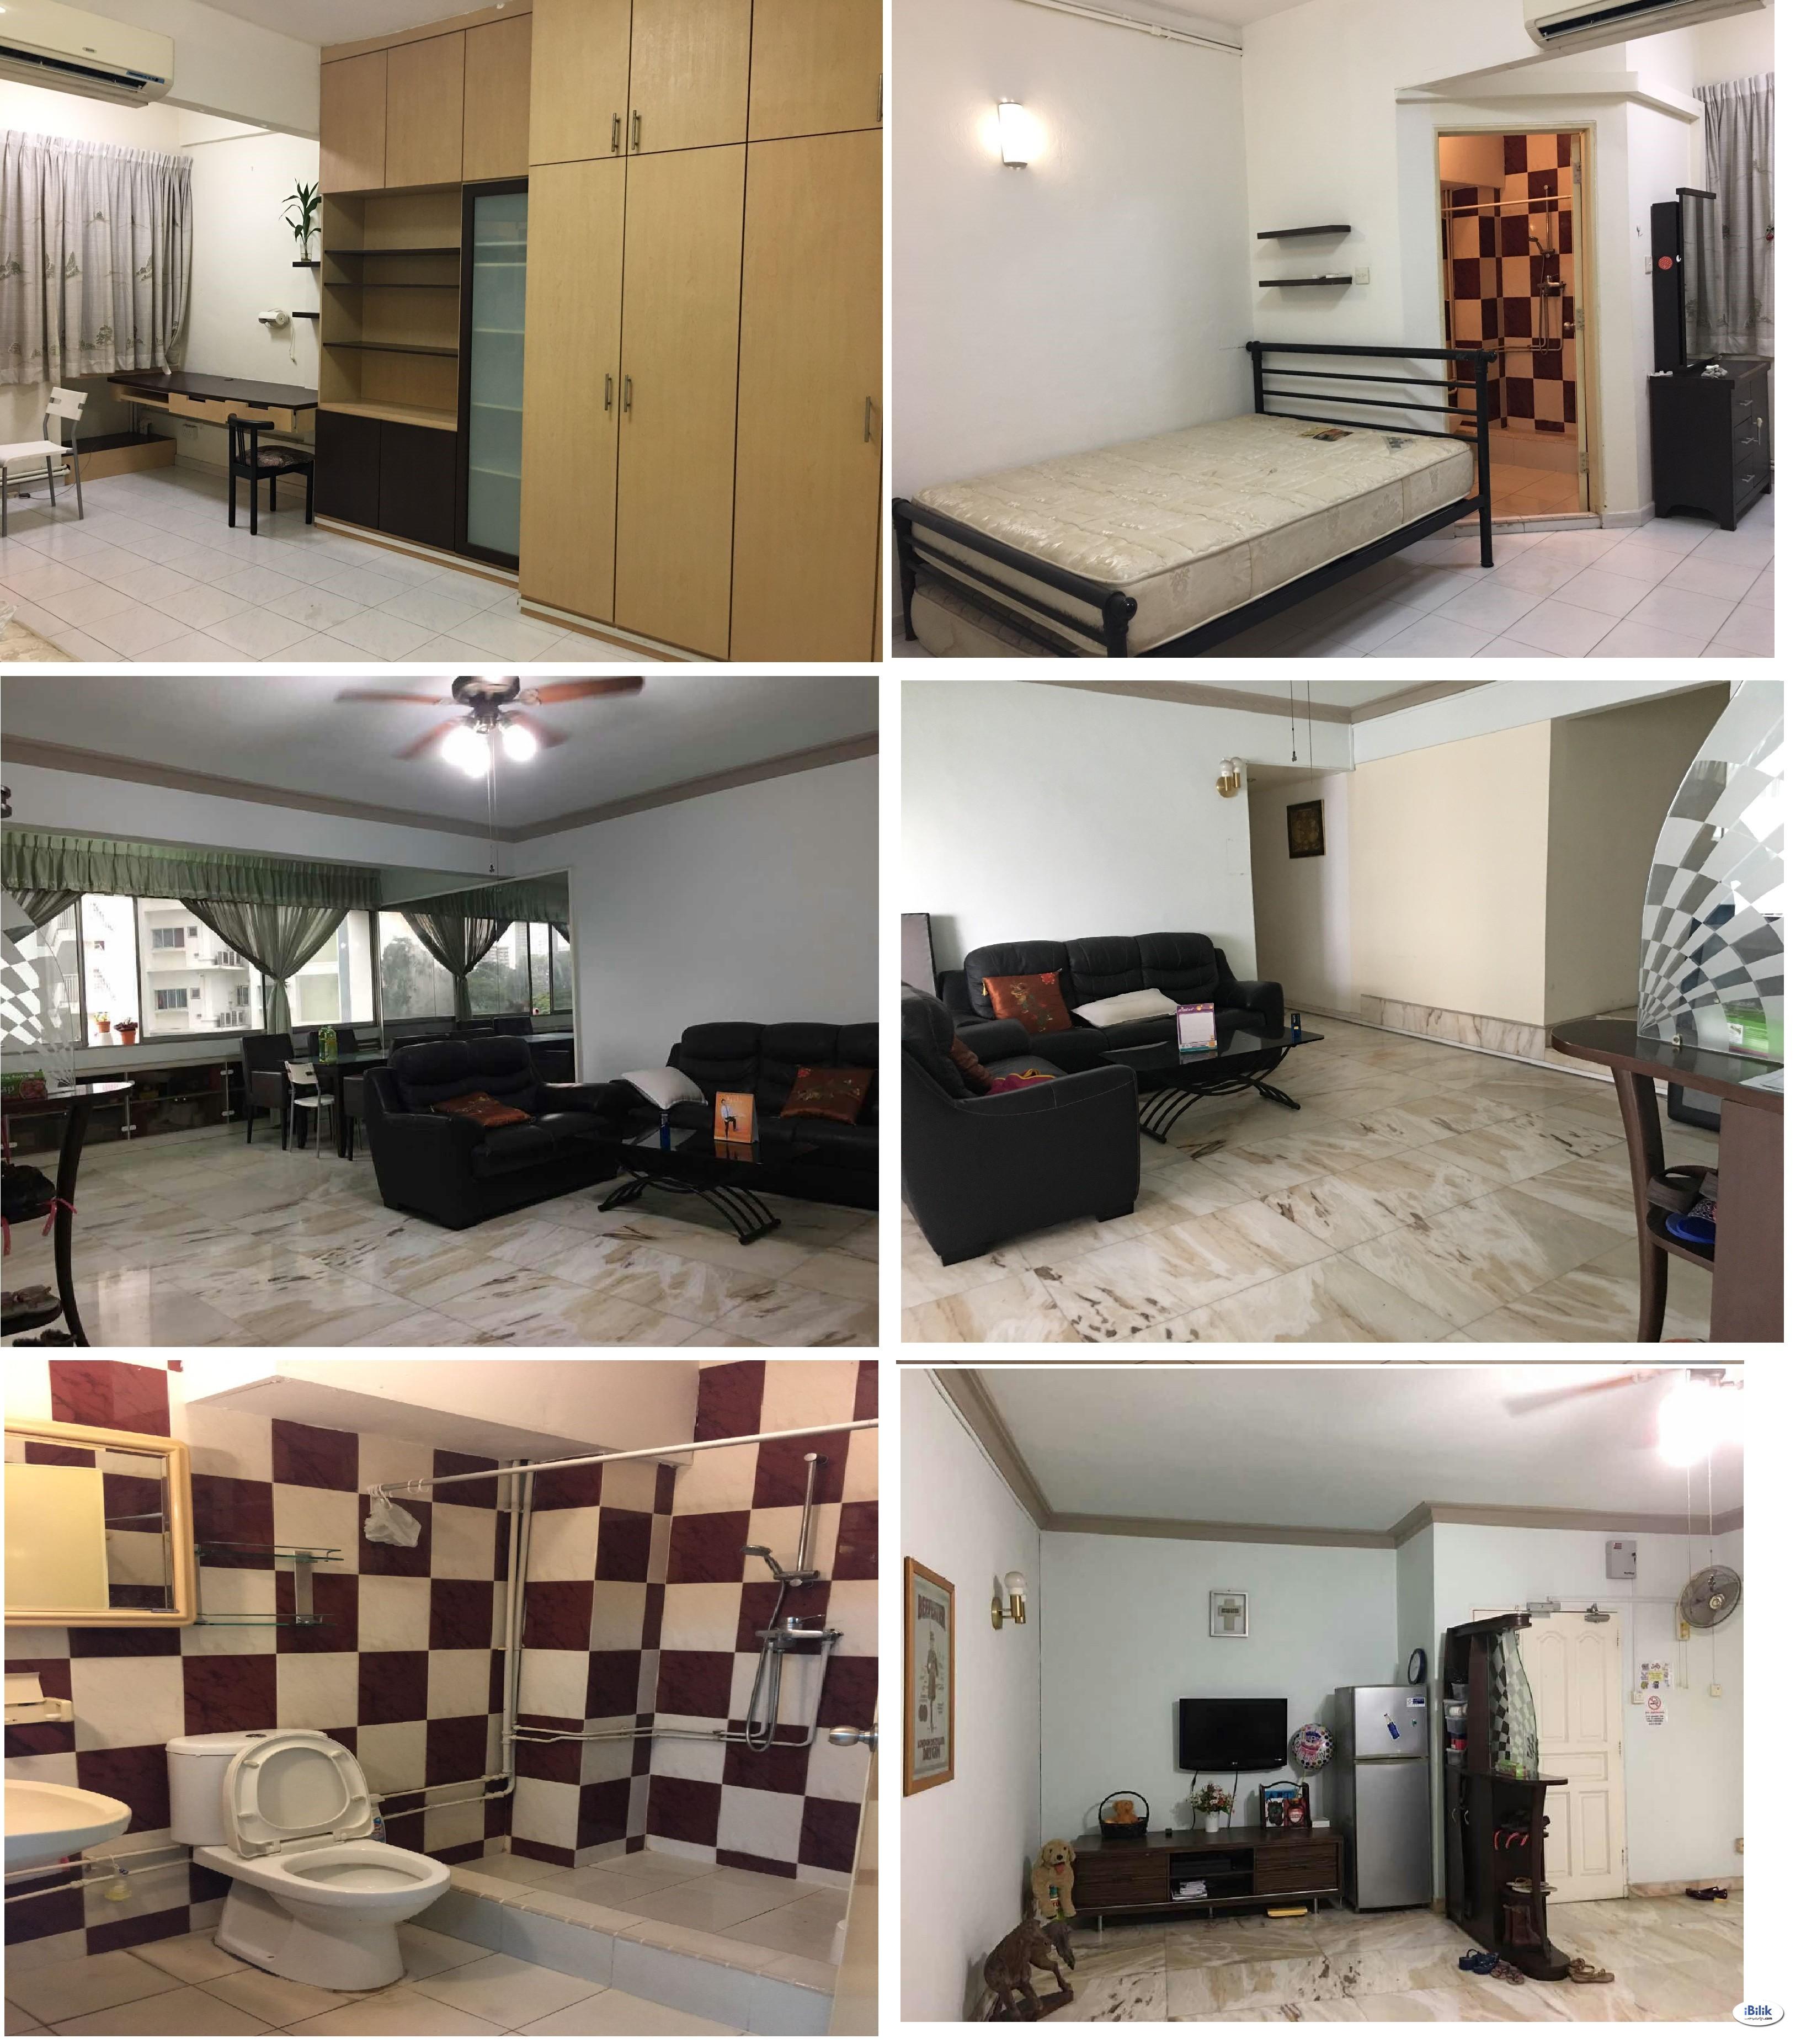 Novena Balestier 280 Sq Ft huge master bedroom with Ensuite Bathroom in Mandalay